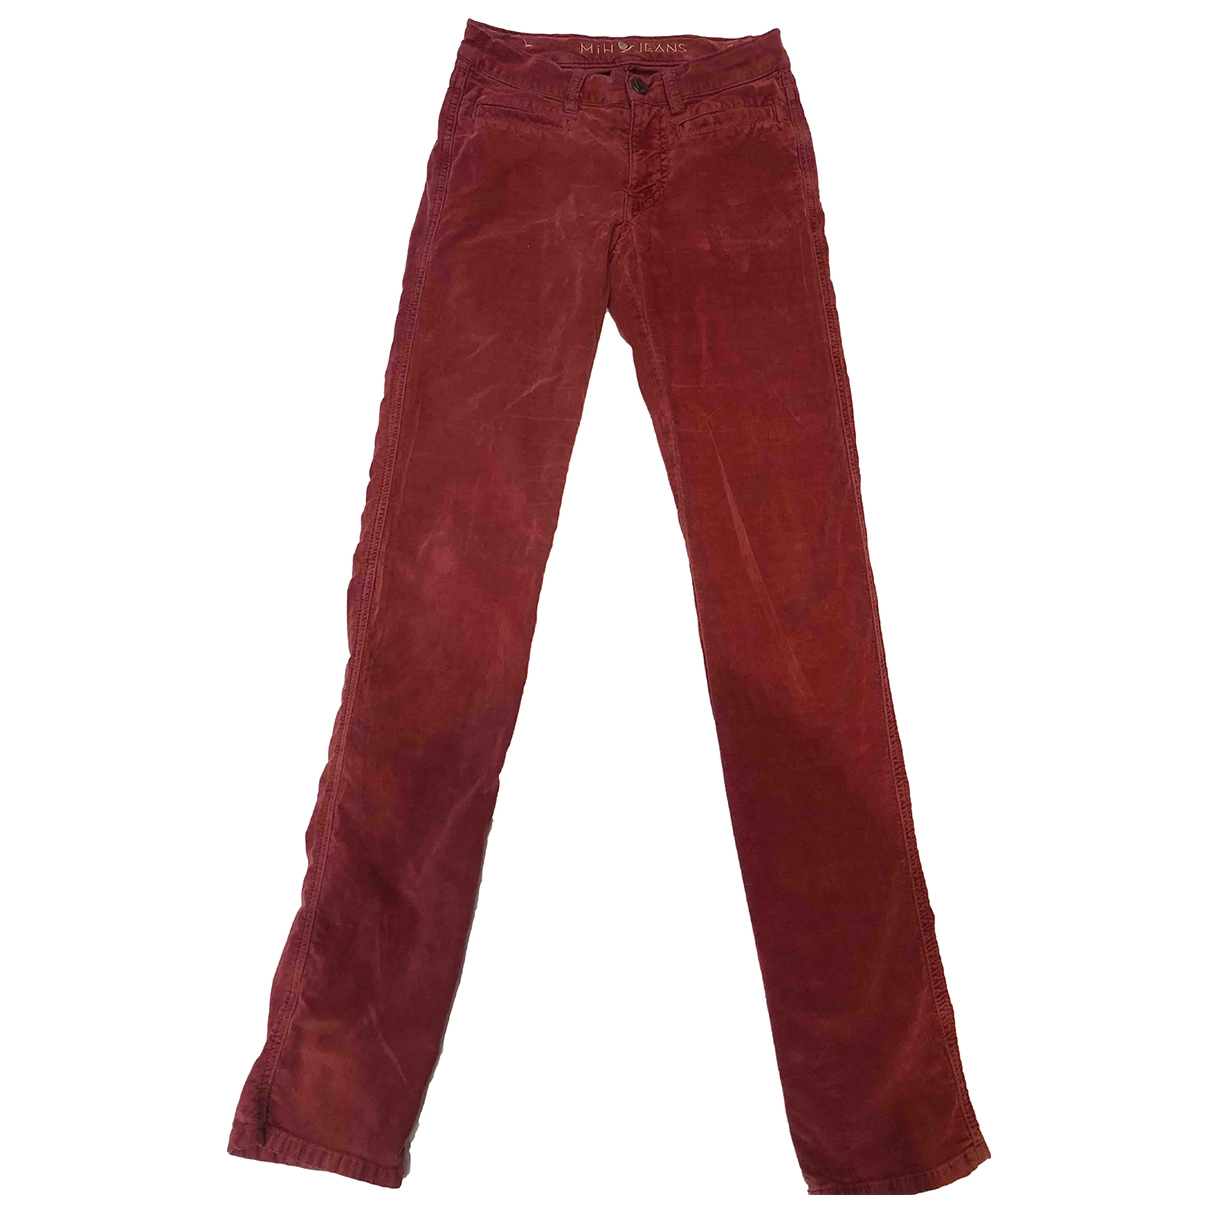 Vaquero pitillo Mih Jeans